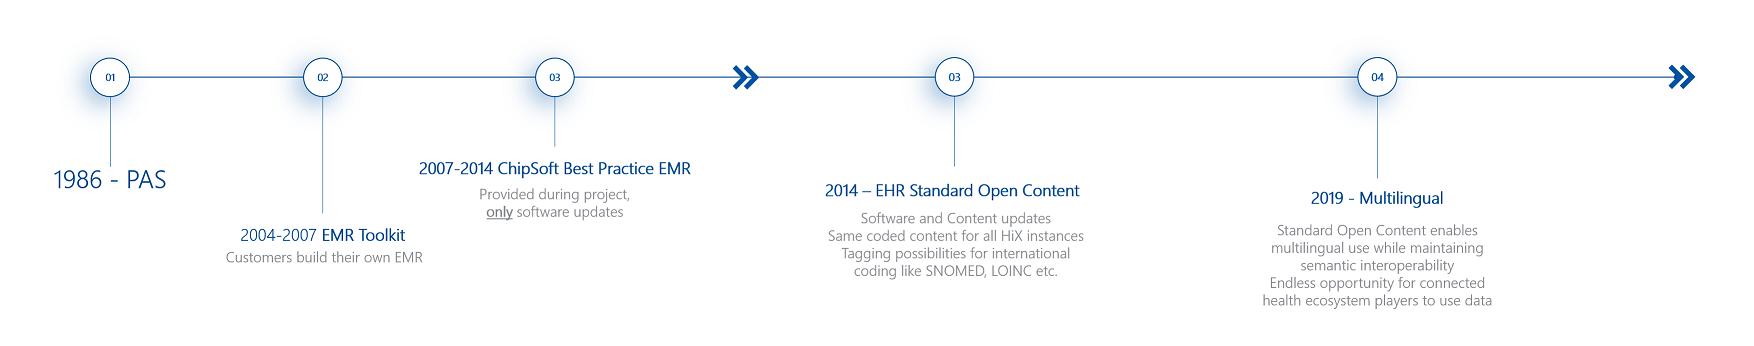 The evolution of HiX' Standard Open Content